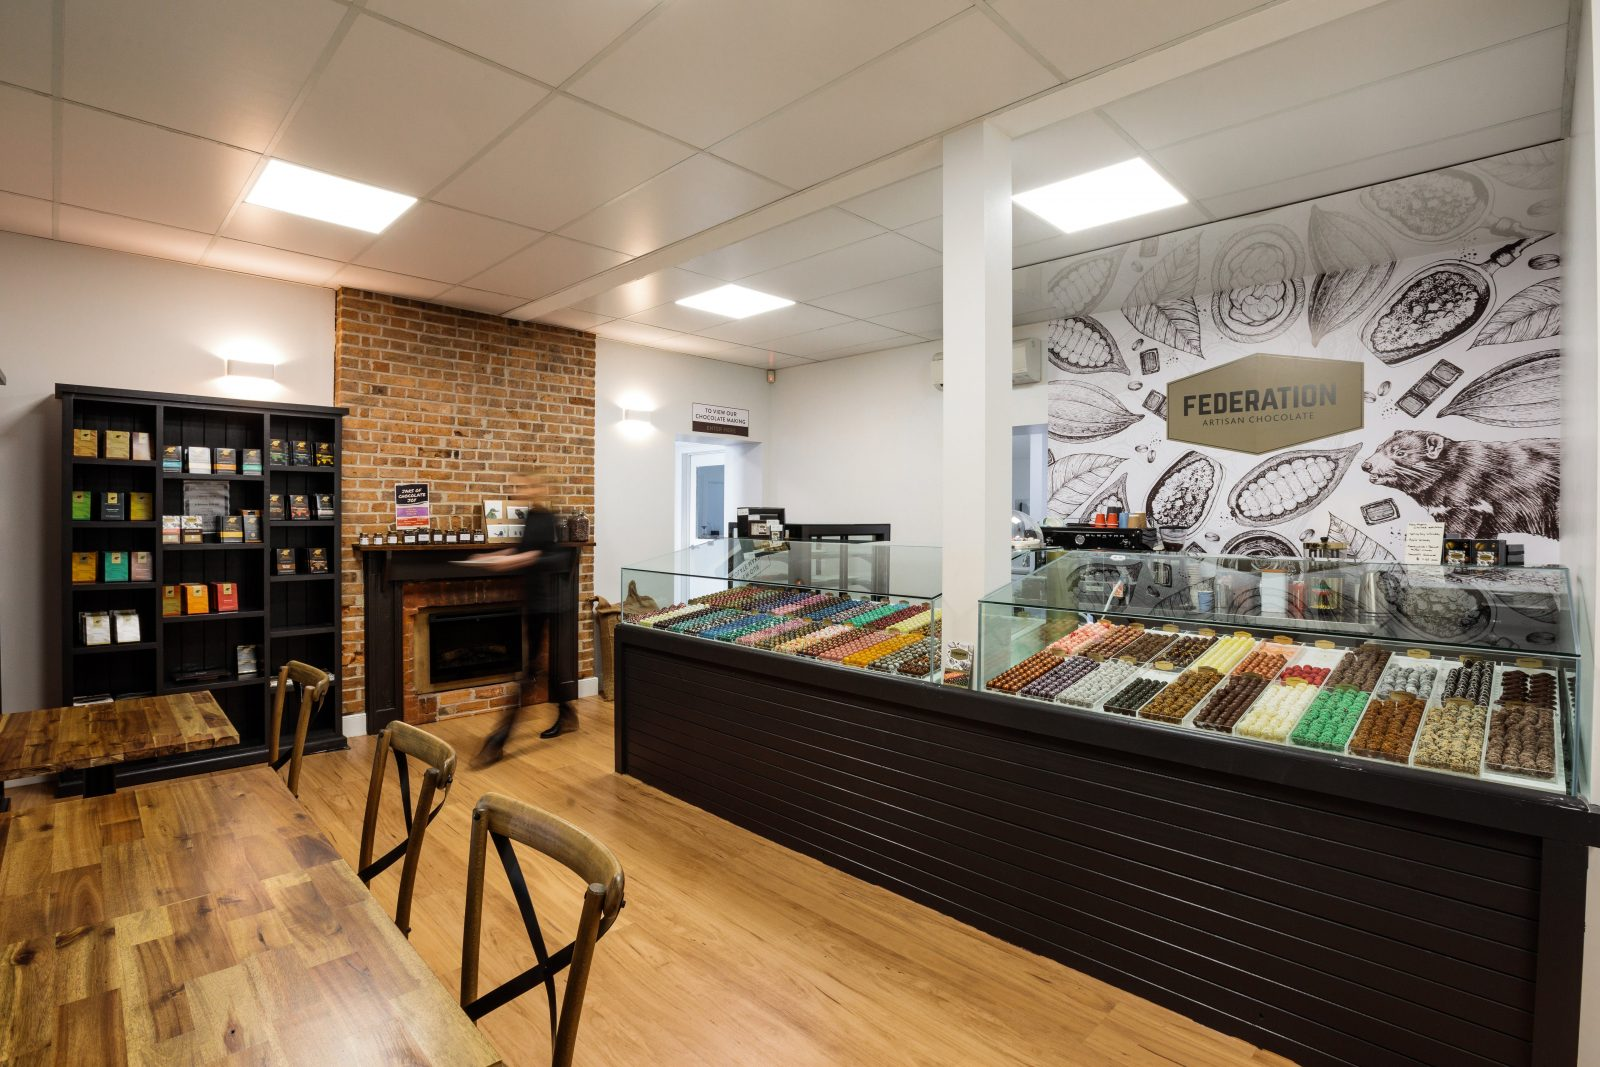 Federation Artisan Chocolate Hobart Shop praline chocolates, bars and chocolate making